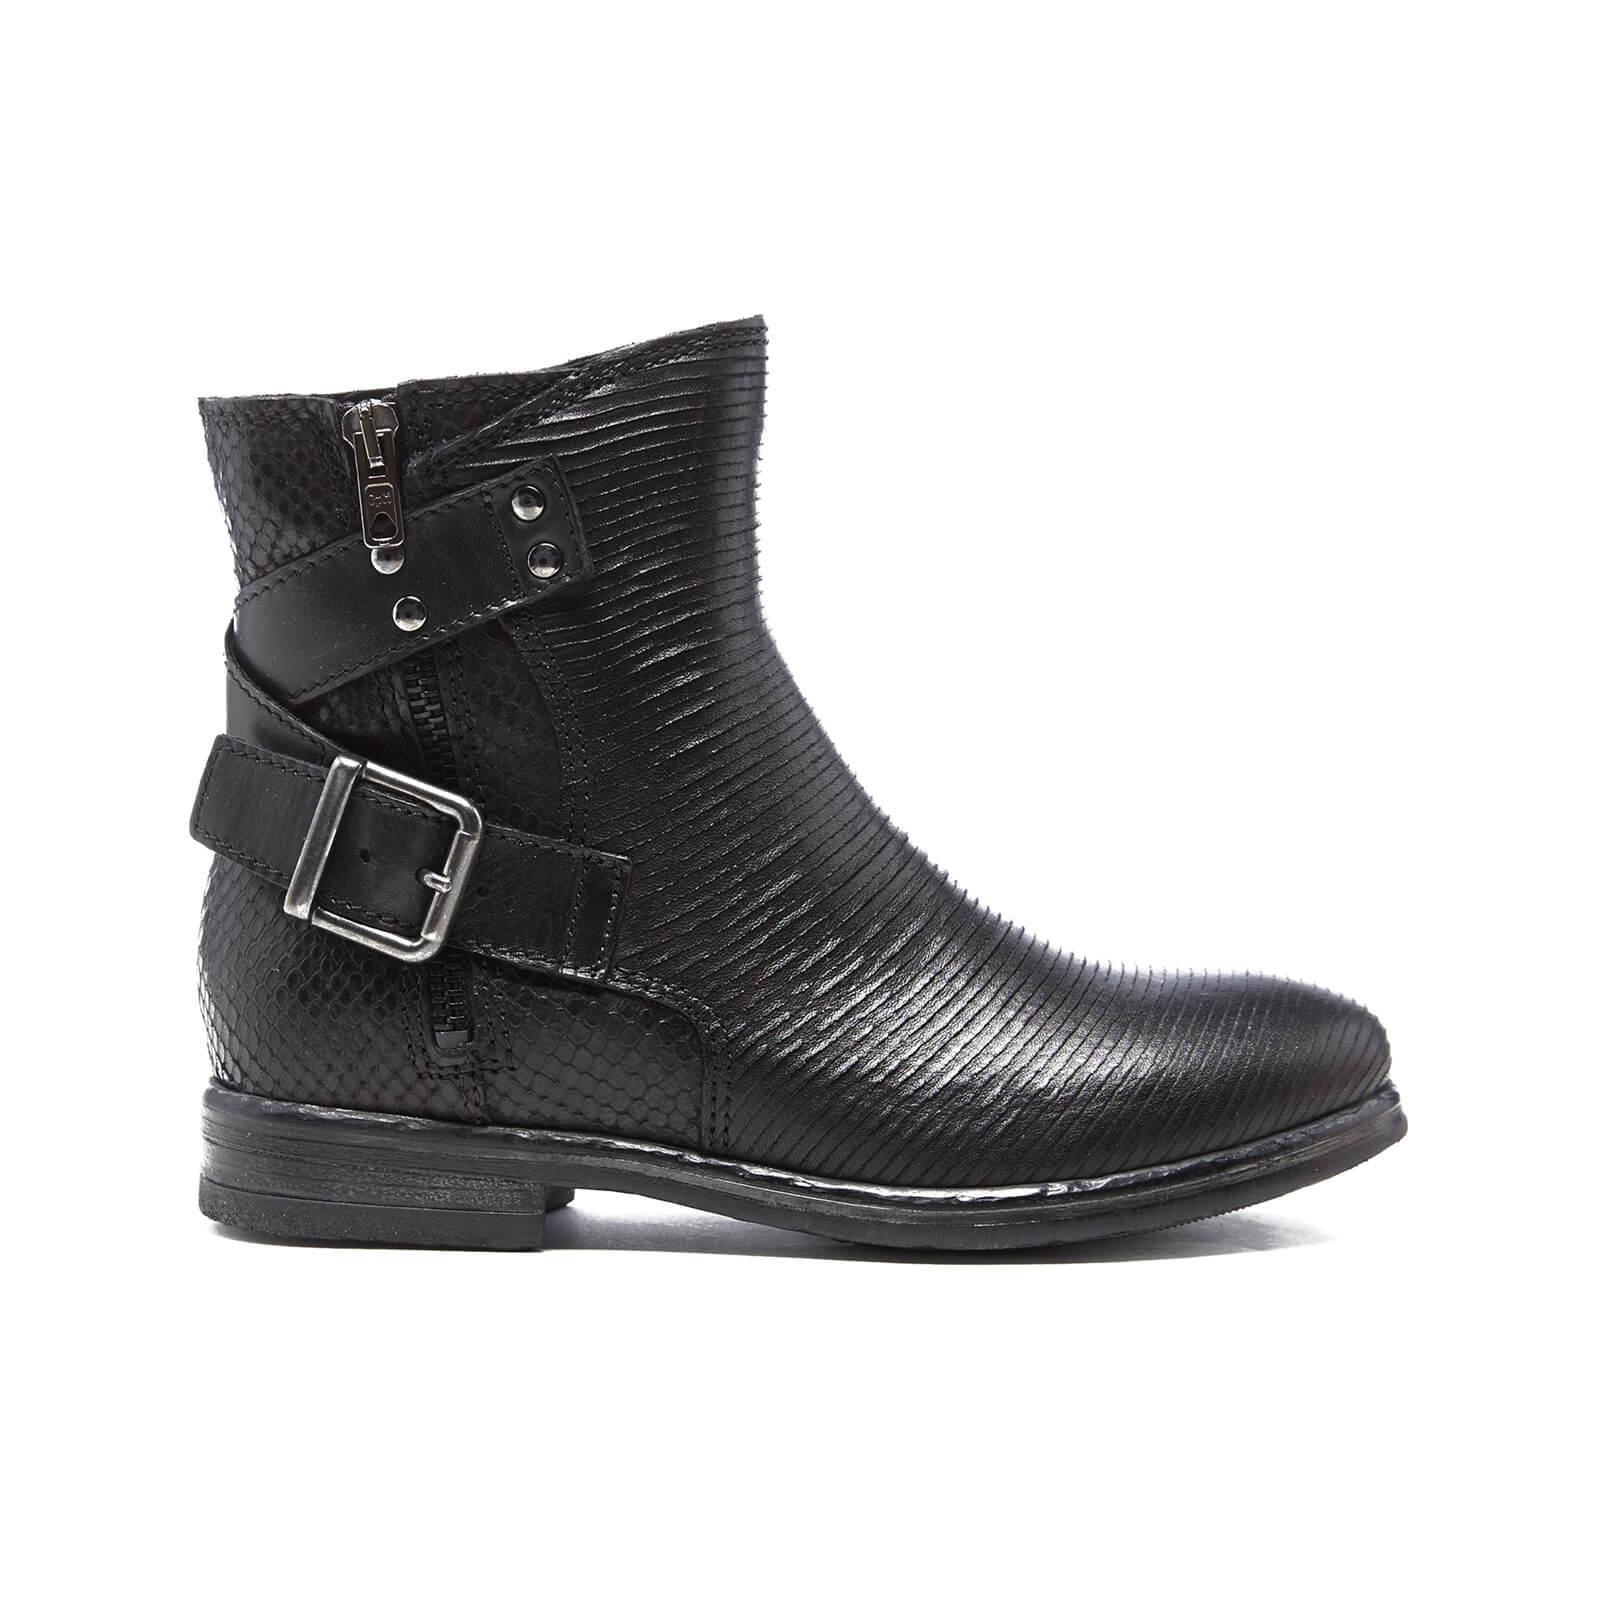 9b86300d92c Clarks Women's Sicilly Dove Leather Biker Boots - Black